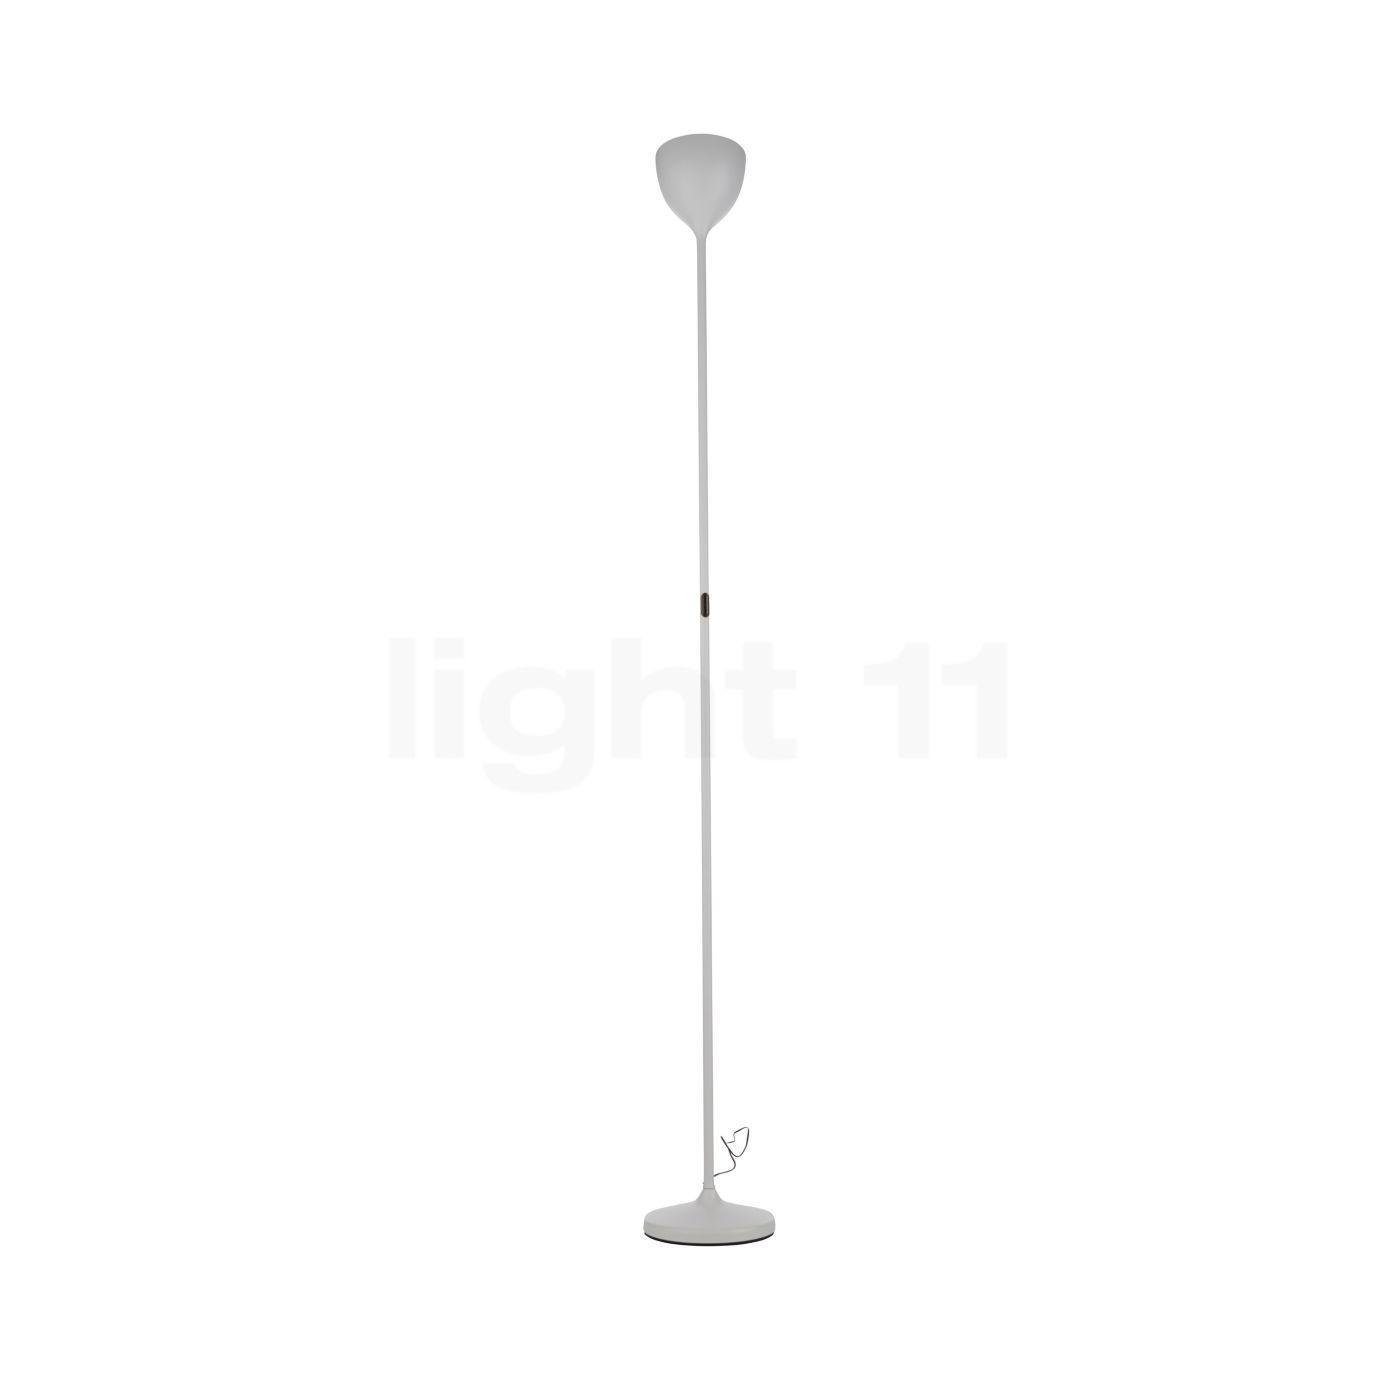 Rotaliana drink f1 led floor lamps buy at light11 aloadofball Images